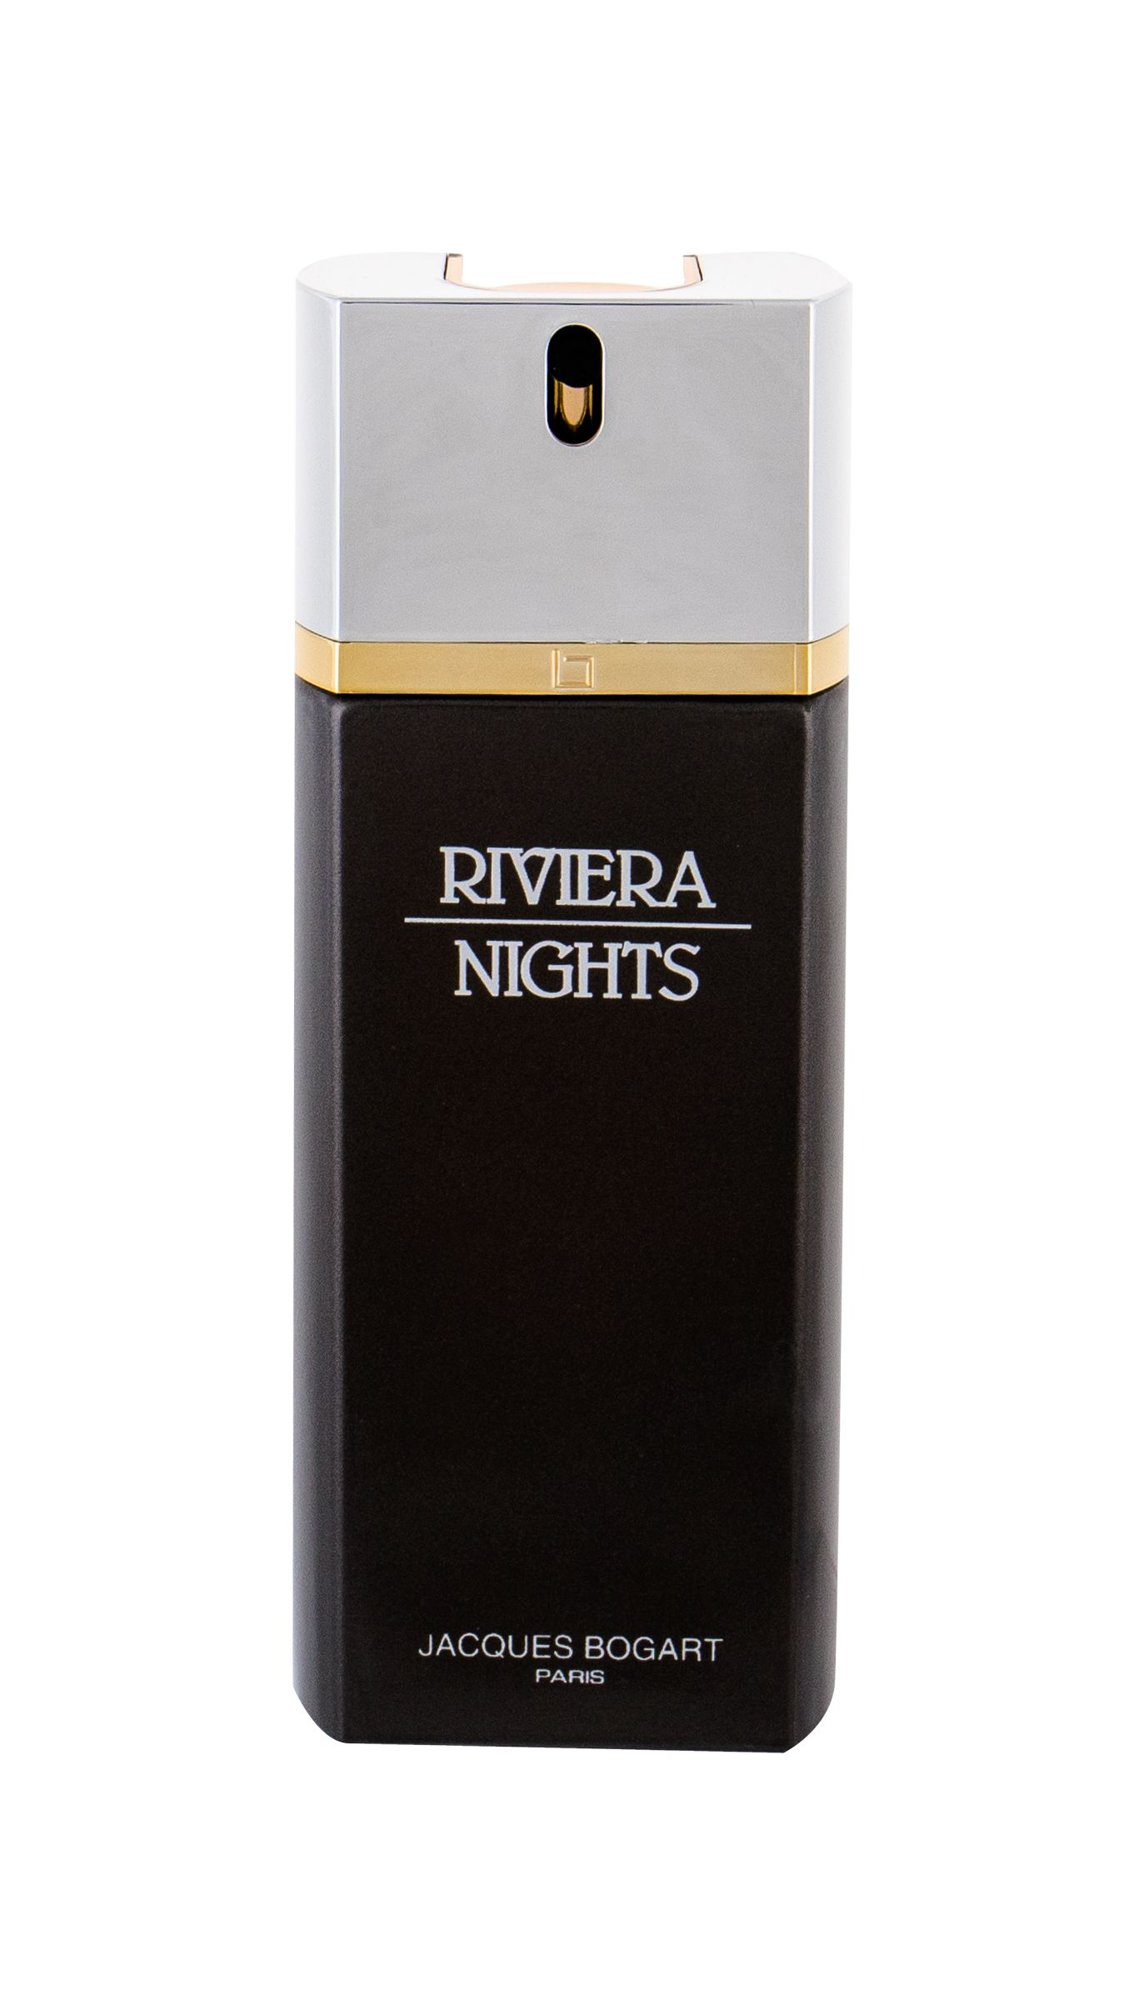 Jacques Bogart Riviera Nights